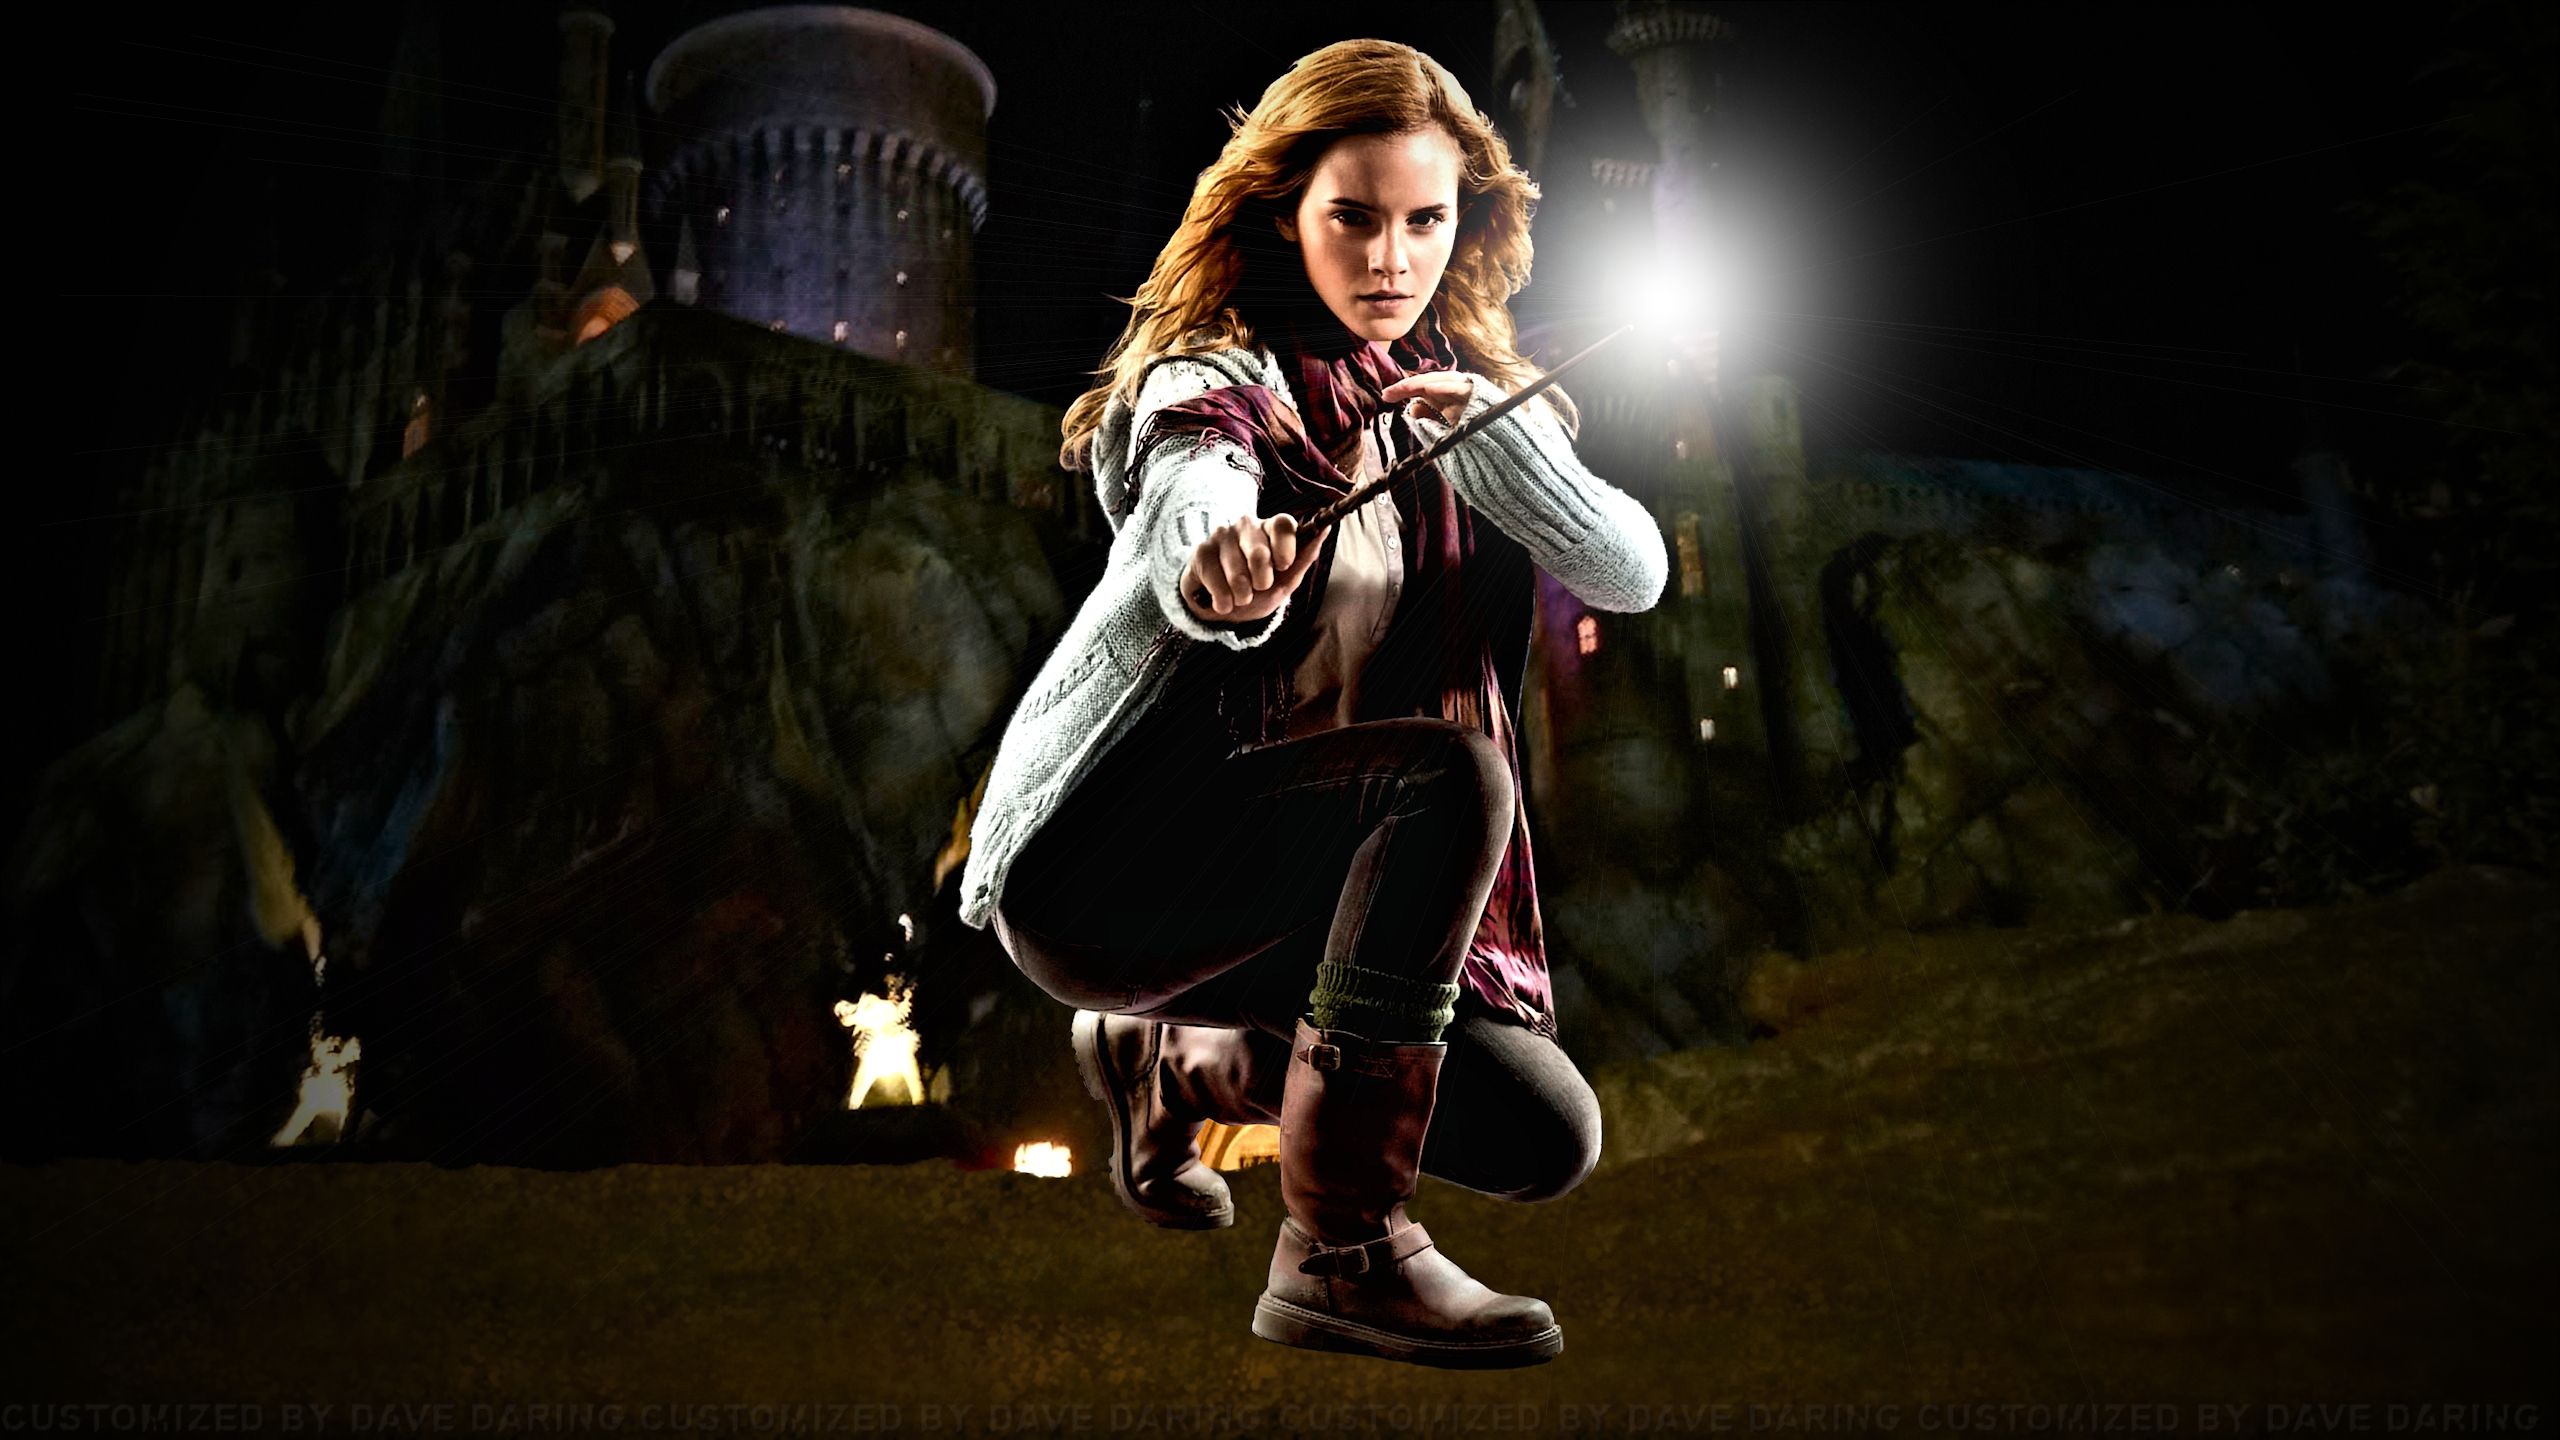 Emma Watson Hogwarts Defender Improved by Dave-Daring